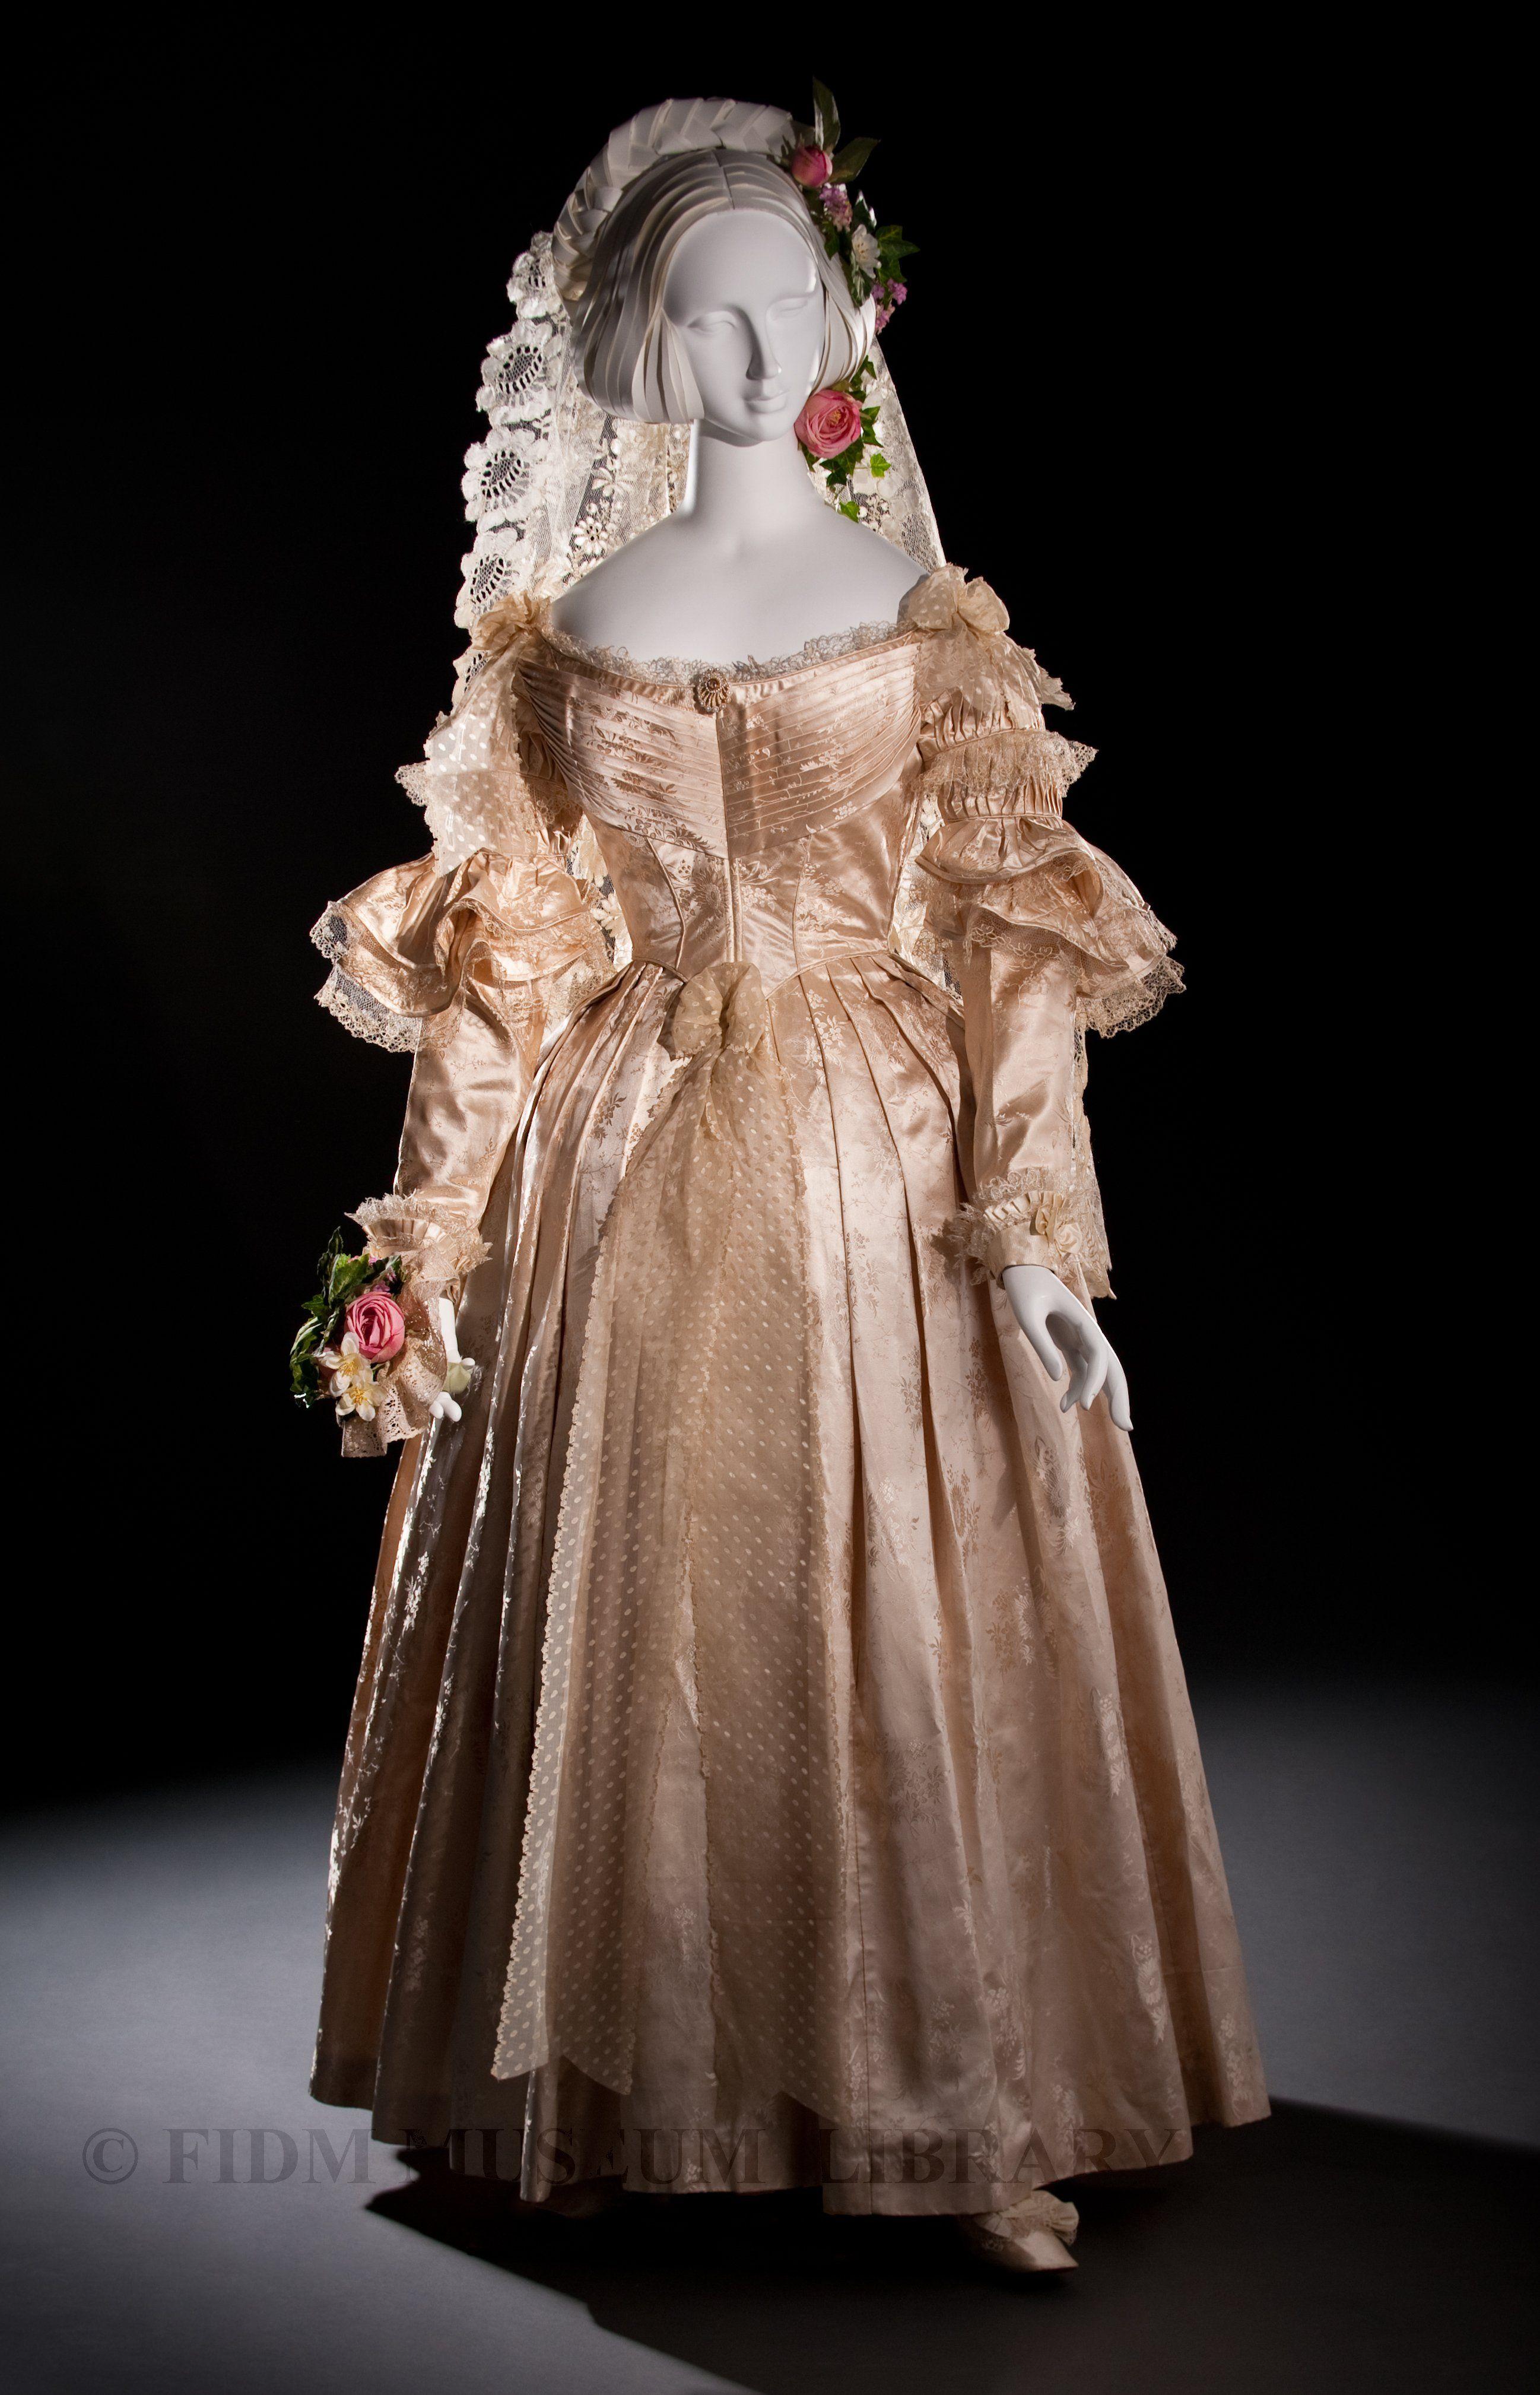 Wedding Gown ca. 1838, England, jacquard silk, blonde